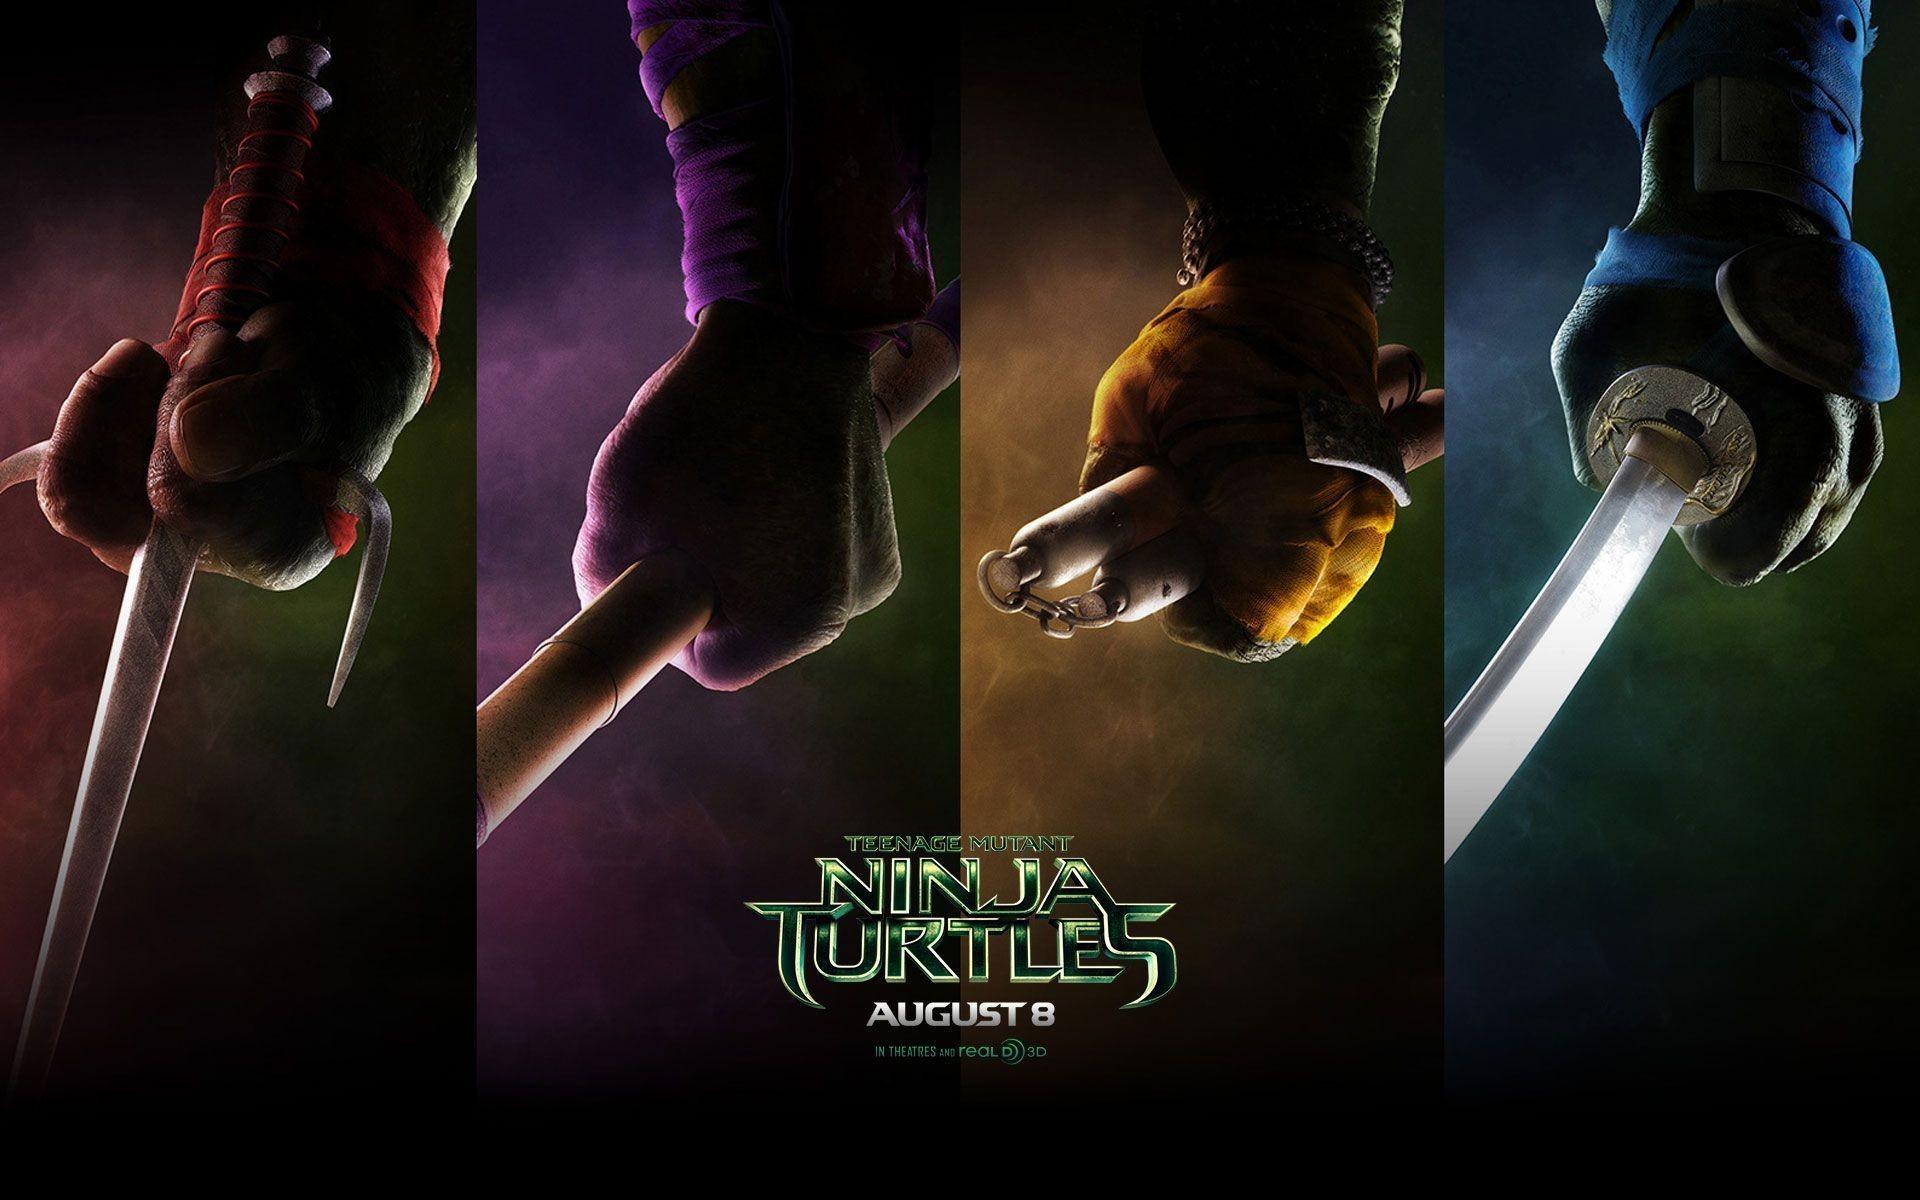 Teenage-Mutant-Ninja-Turtles-2014-Desktop-Wallpaper-HD1.